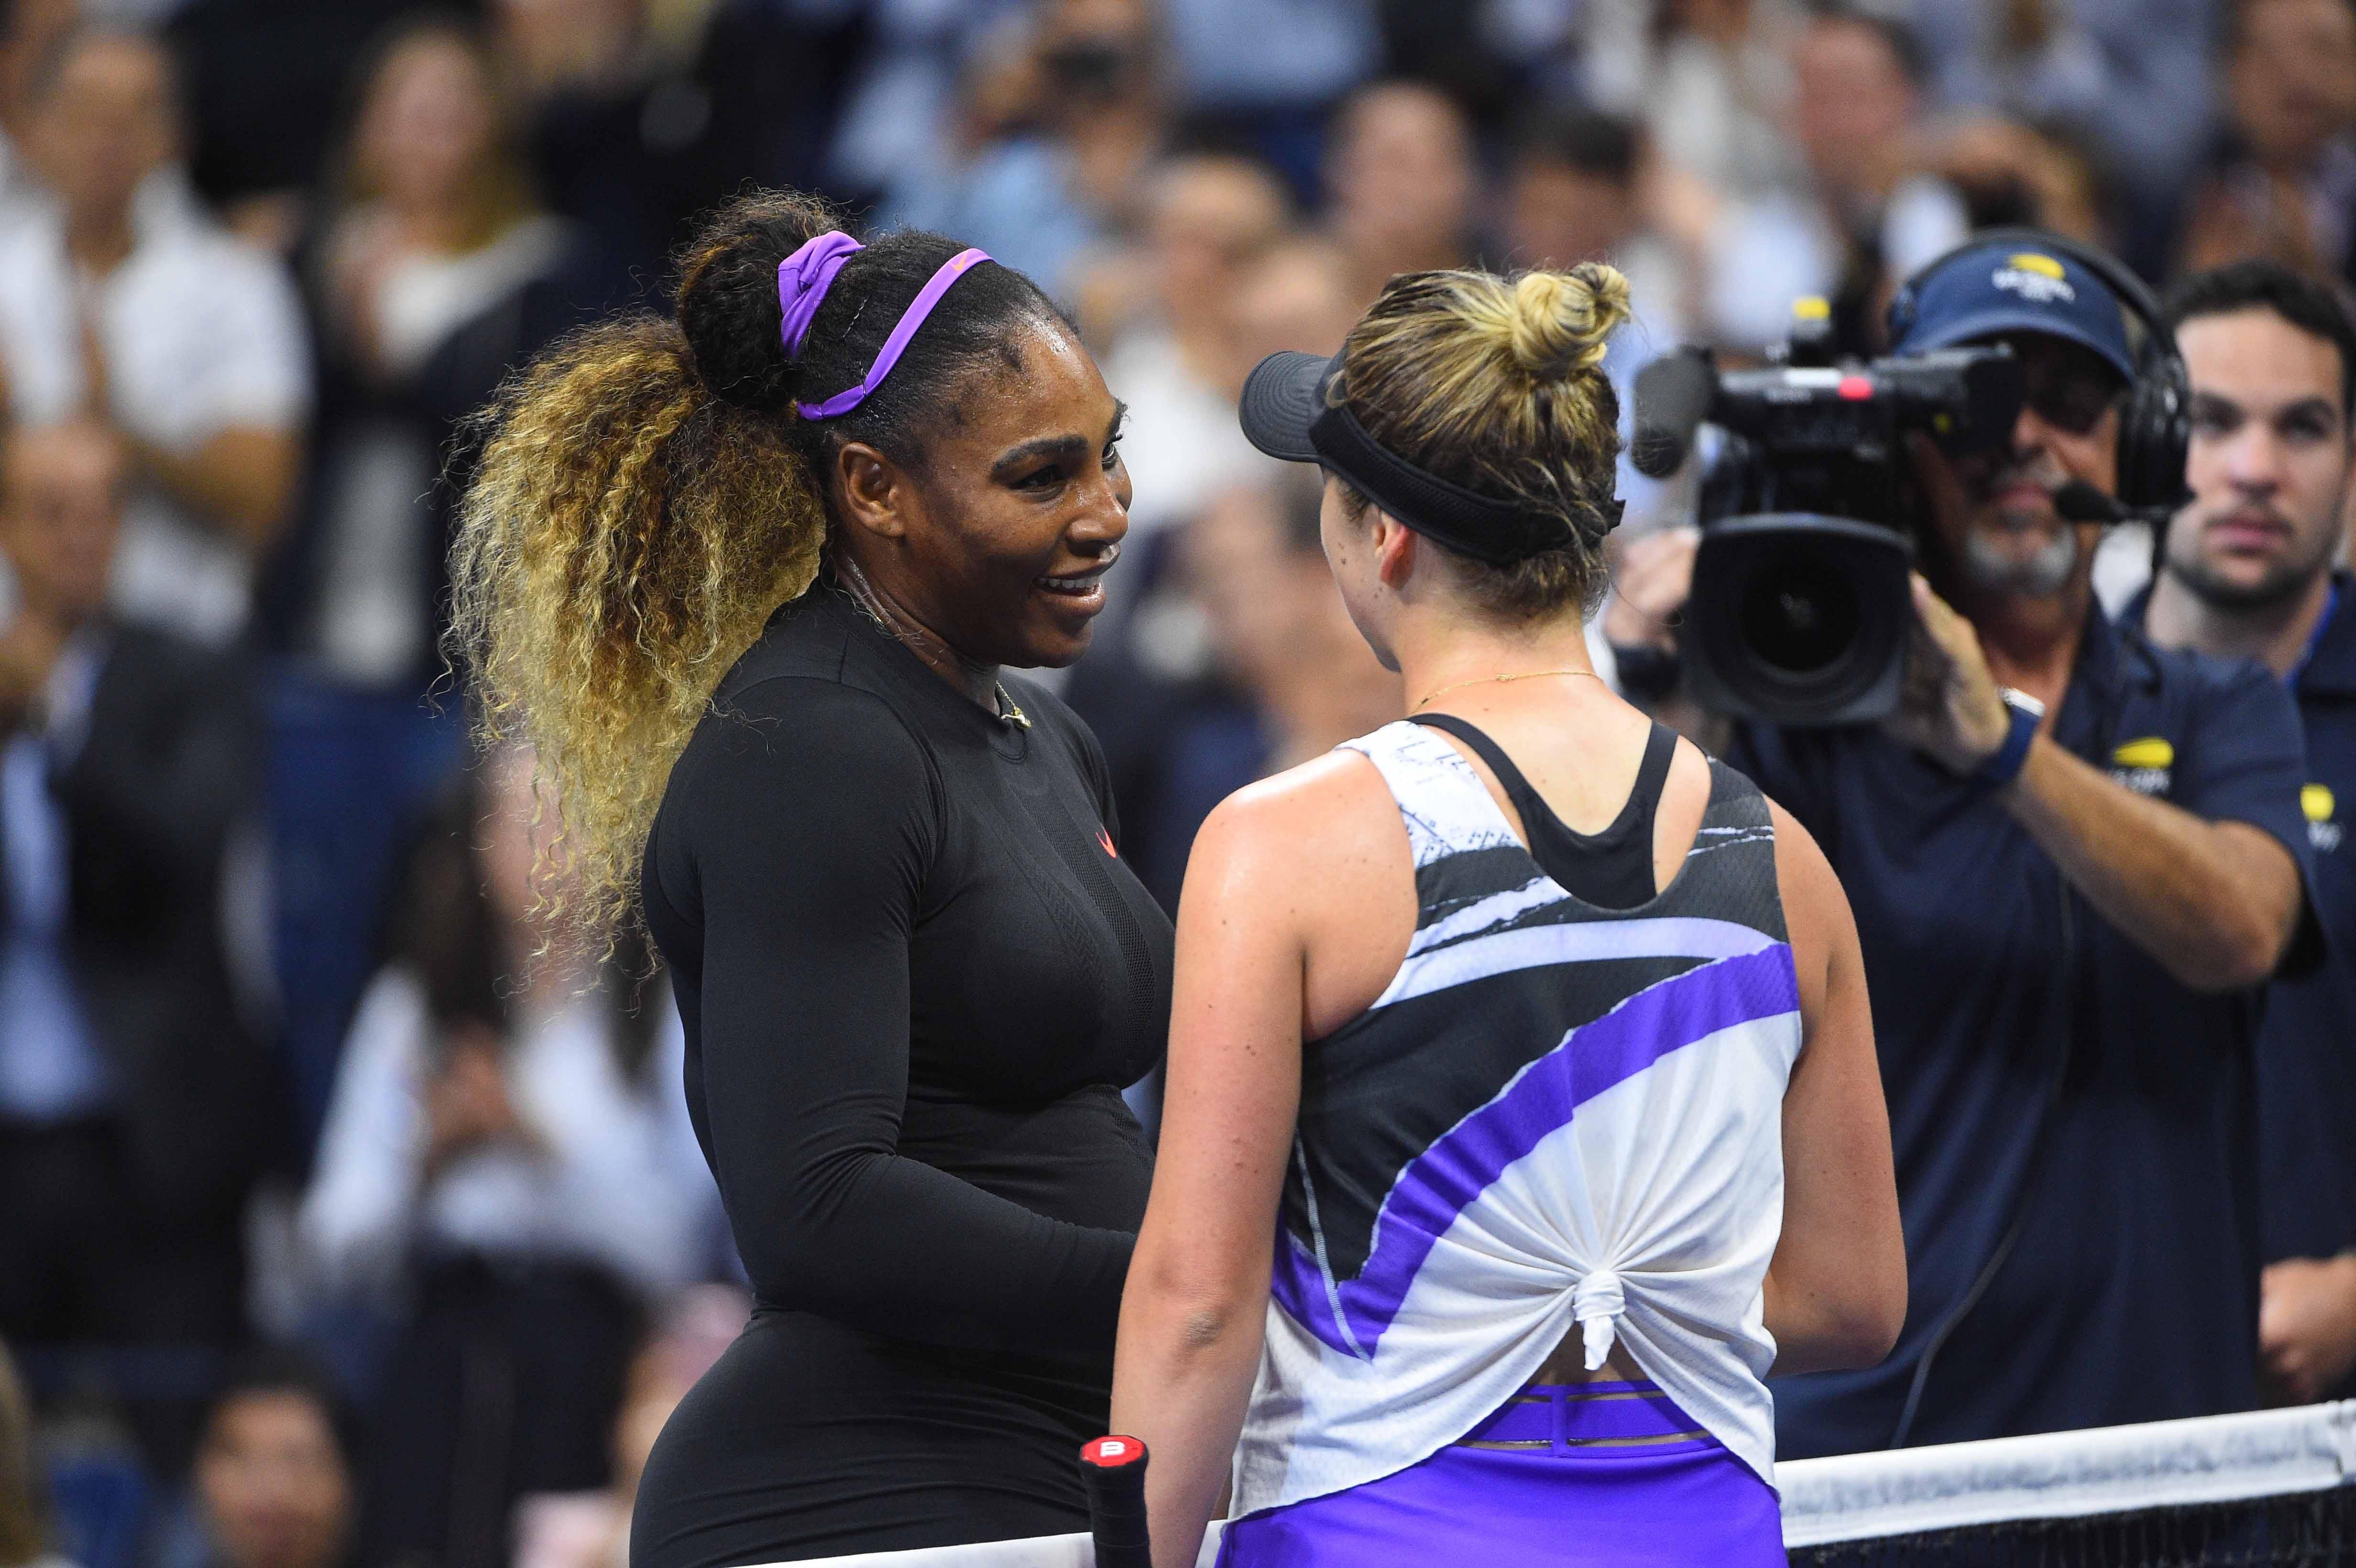 Serena Williams and Elina Svitolina at the net 2019 US Open